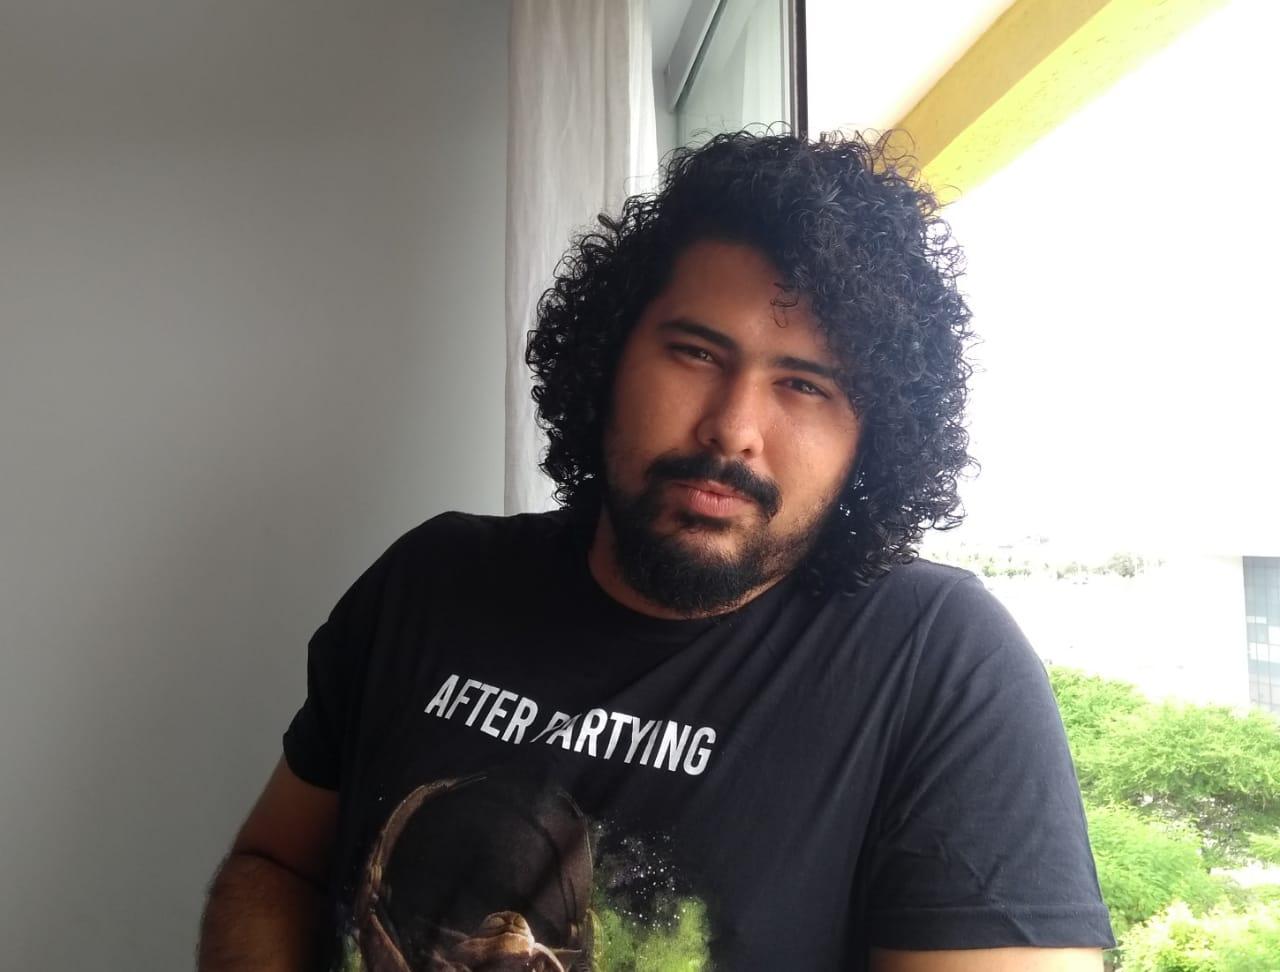 Pablo Silva